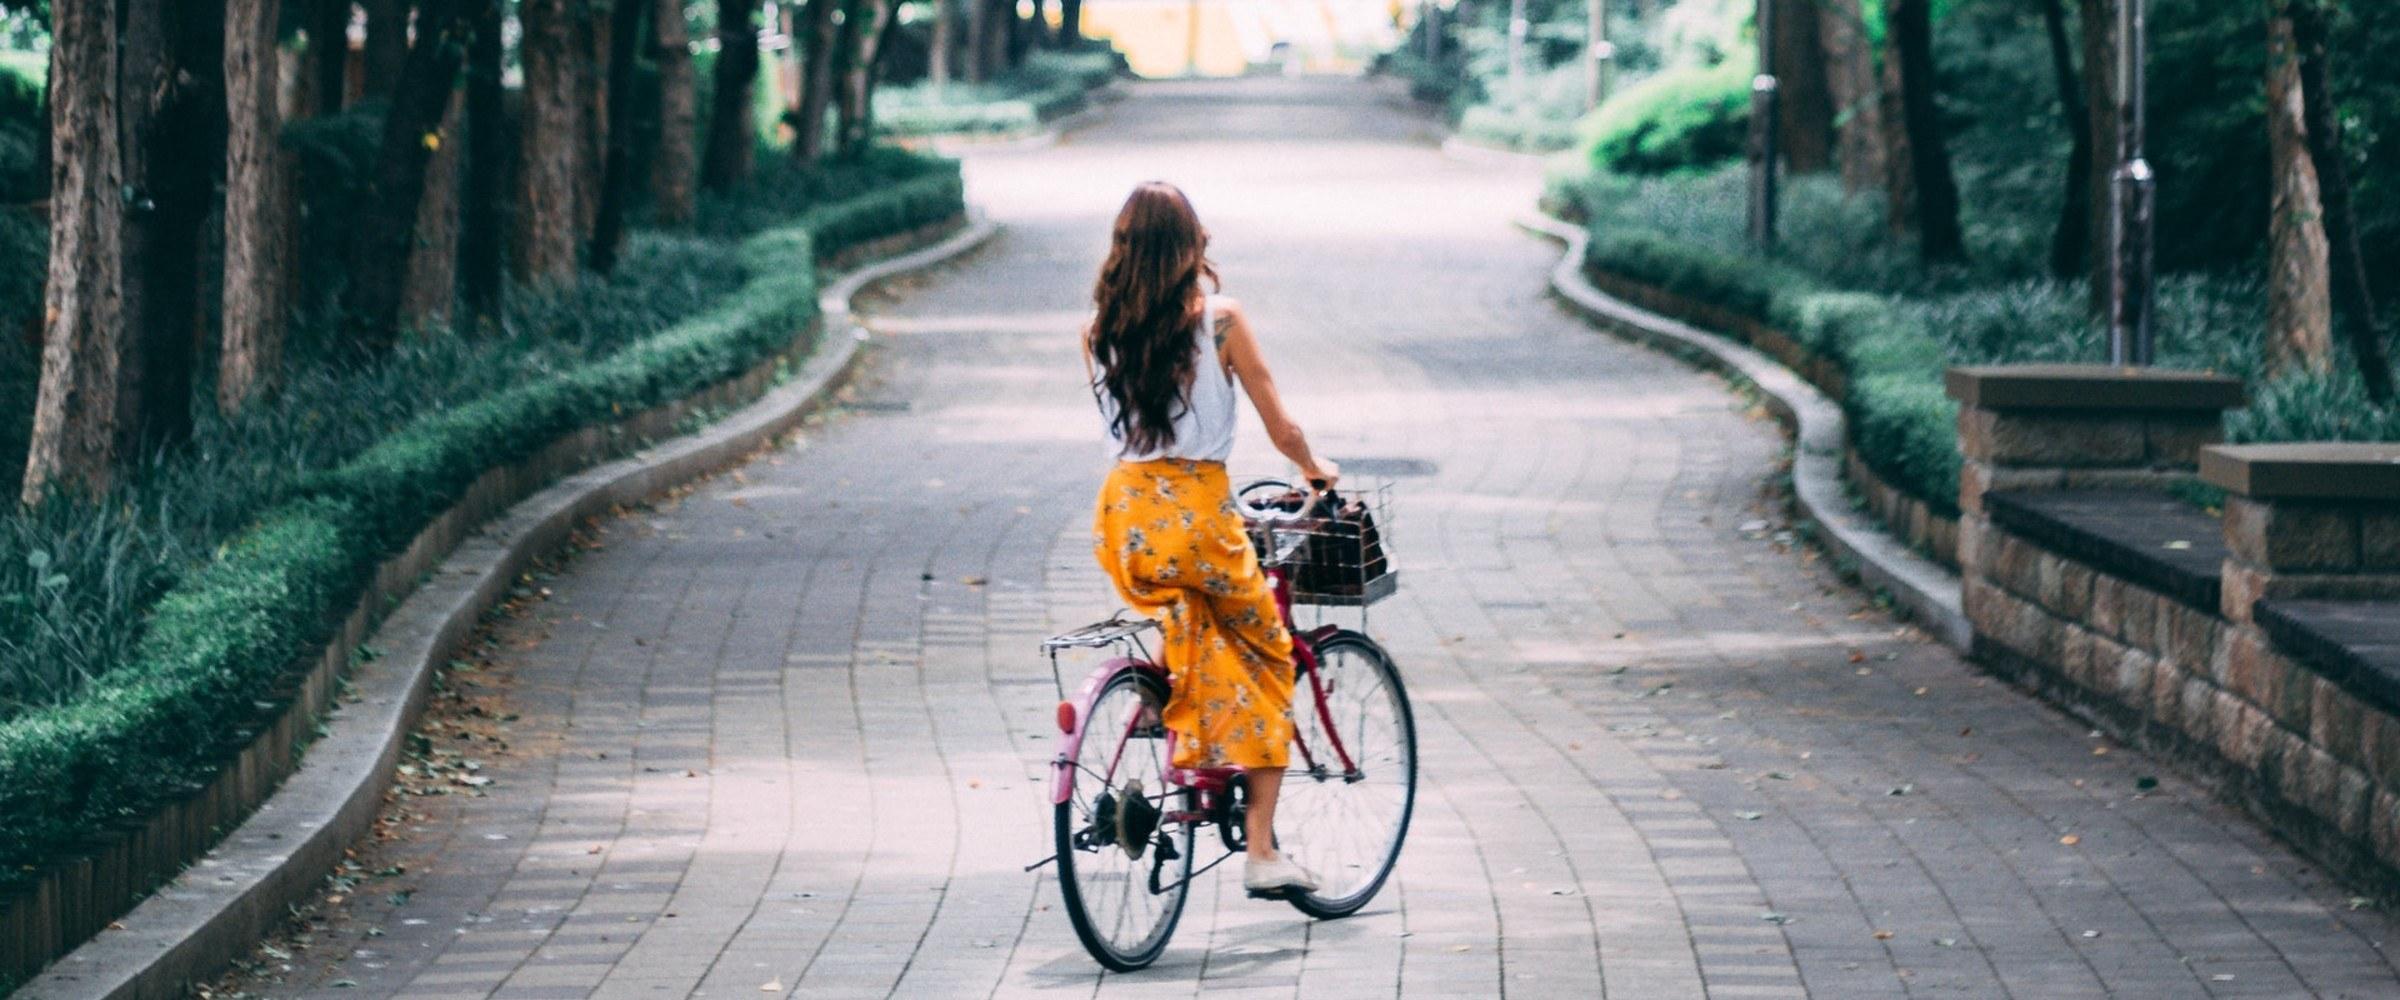 biking in tampa